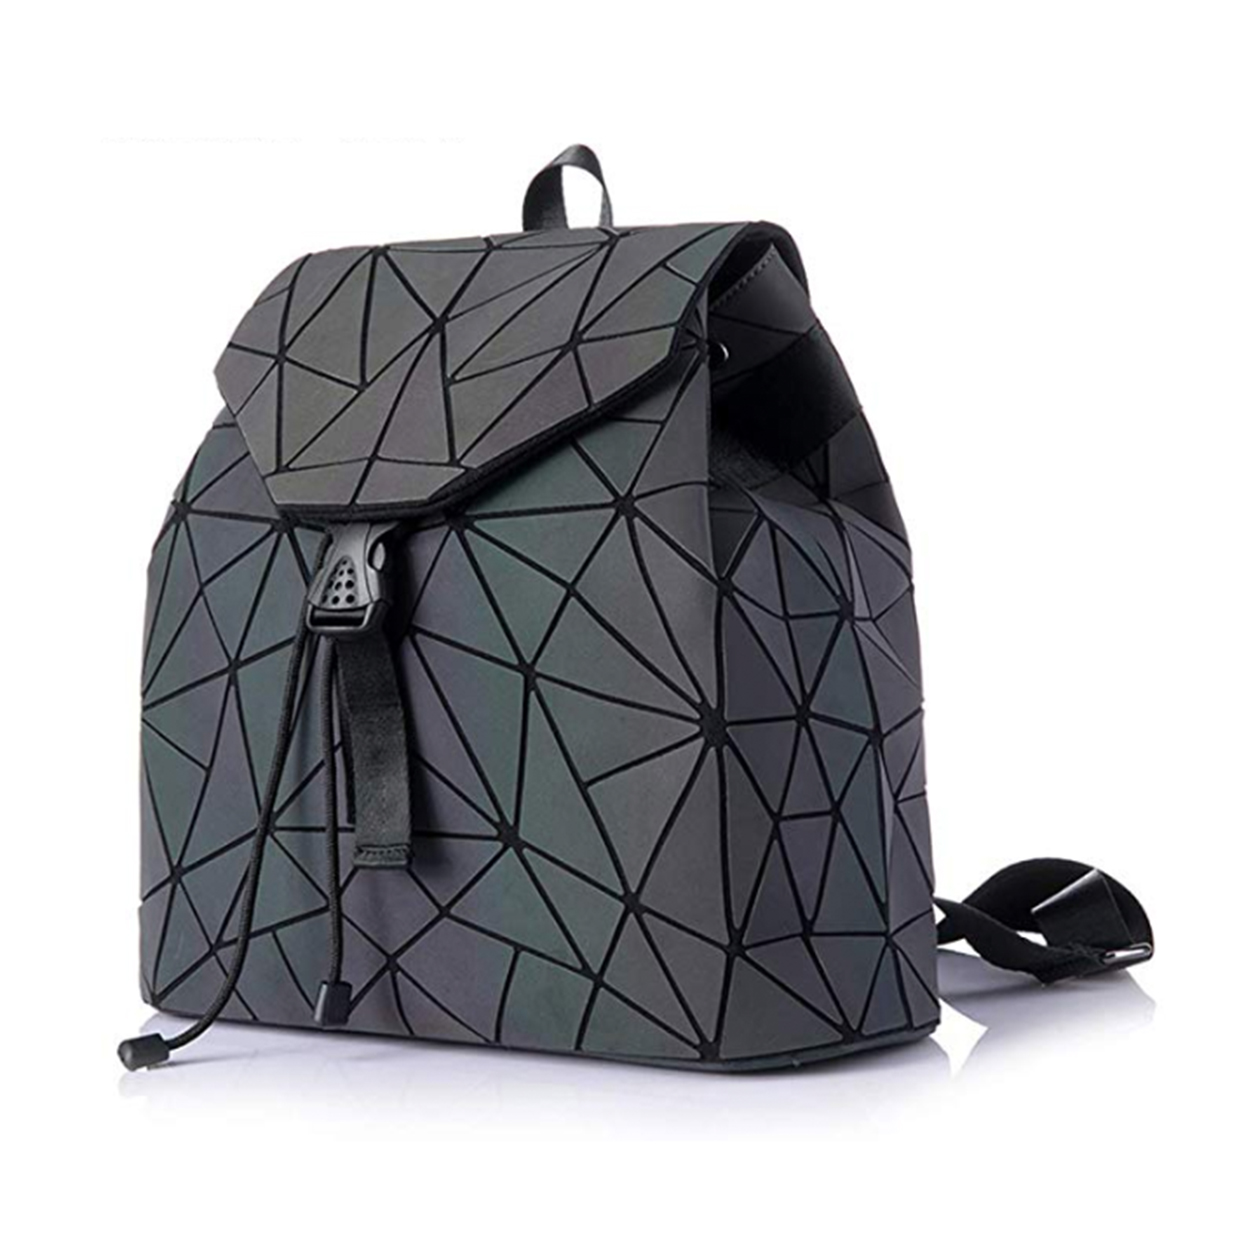 rainbow-luminous-geometric-purse-amazon-3.jpg